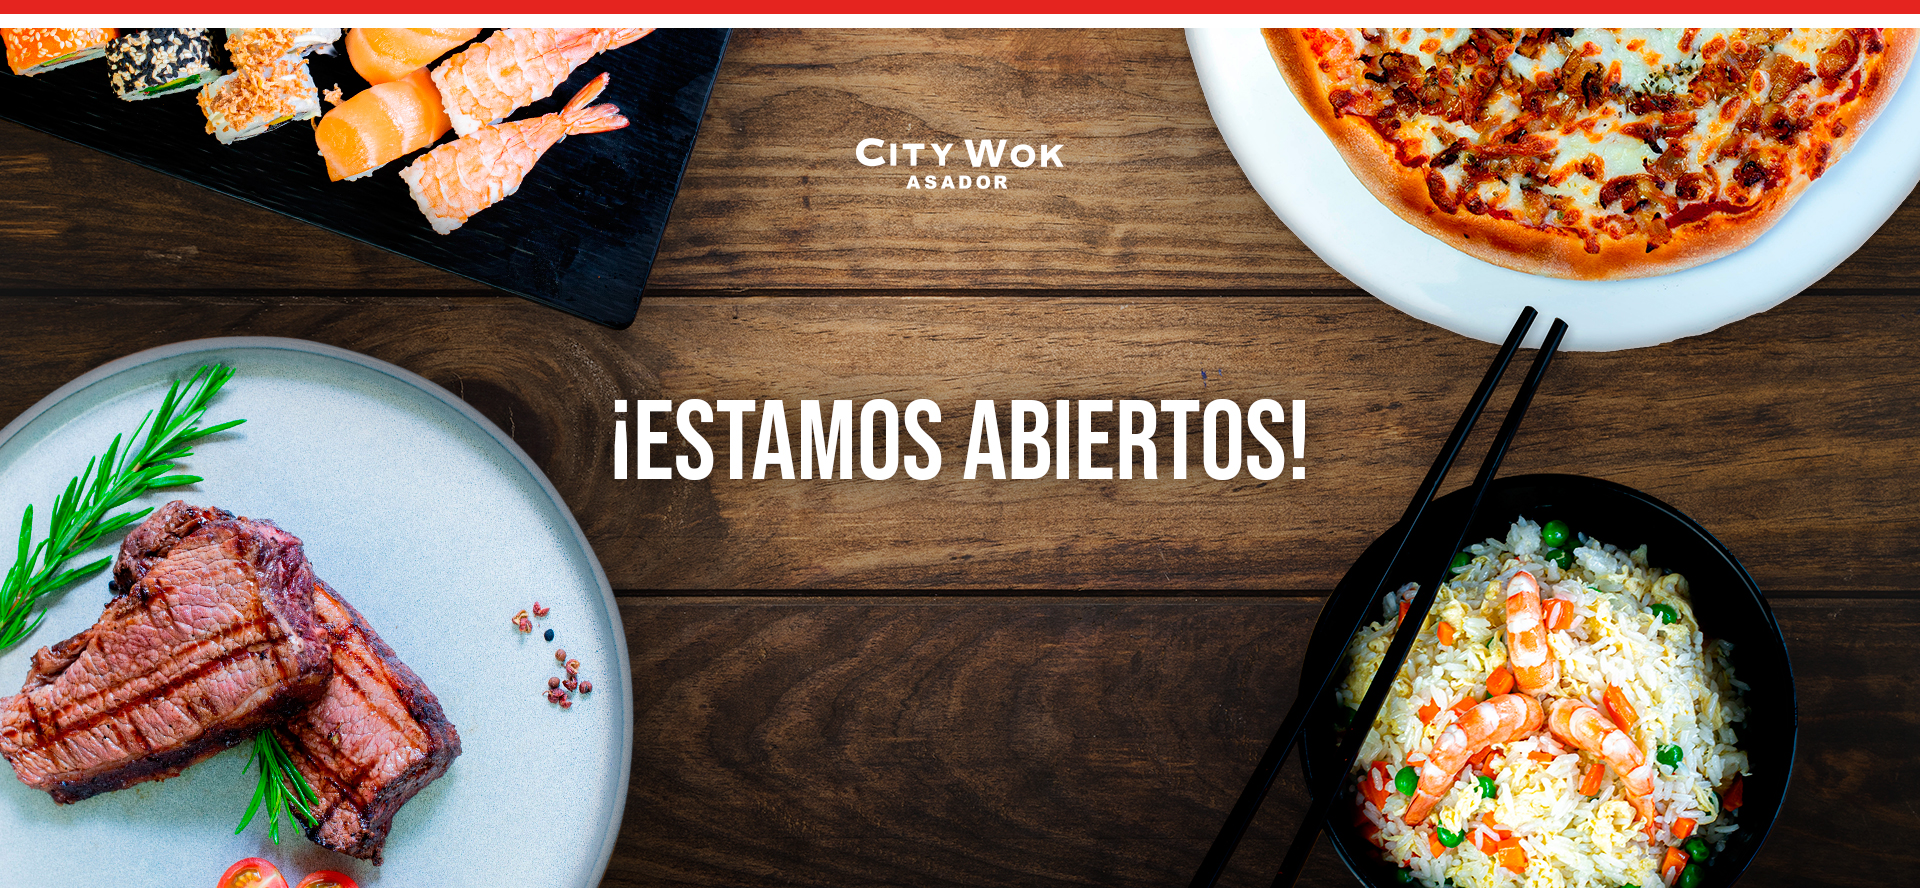 City Wok Guipúzcoa